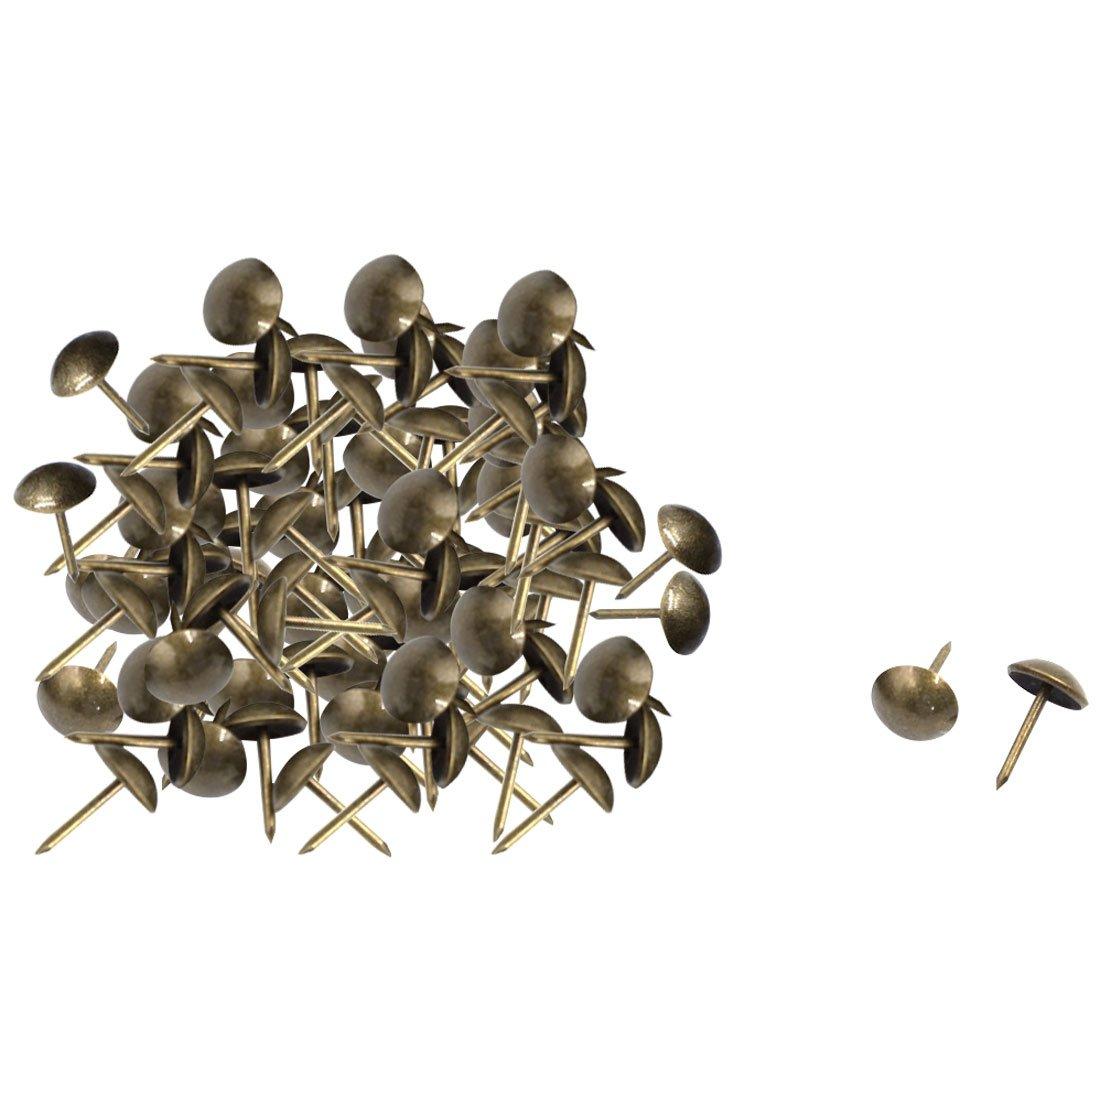 Steel Home Notice Board Thumb Tacks 11mm x 17mm 100pcs Bronze Tone uxcell a15090400ux0179